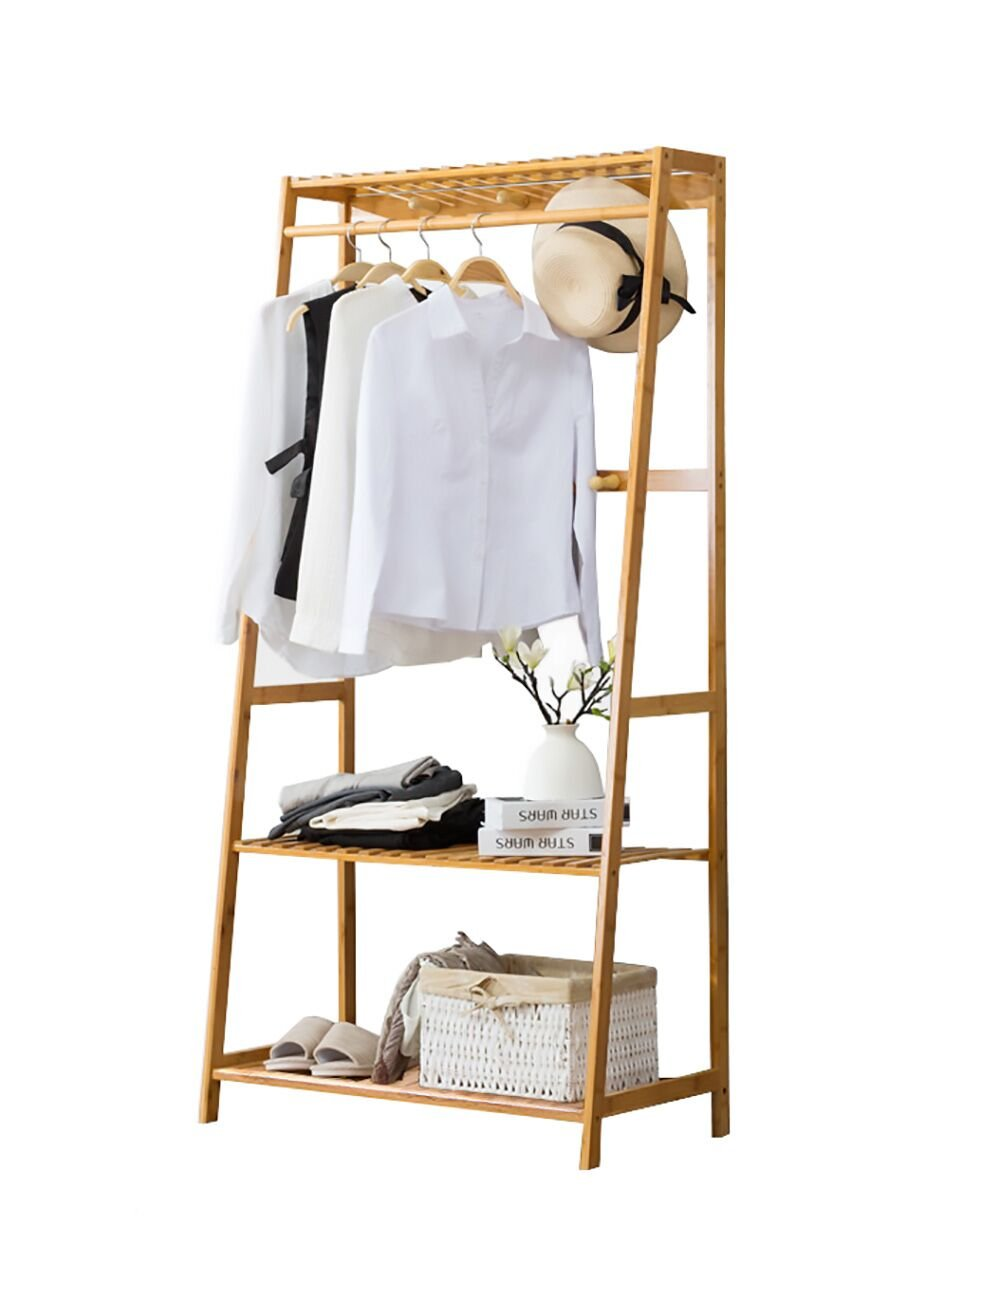 Ufine Garment Rack Bamboo Wood Entryway Clothes Drying Rack with 3 Tier Shoe Storage Shelves Organizer 6 Coat Hooks 1 Clothing Hanger Heavy Duty Wardrobe Closet in Livingroom Bedroom Hallway 65'' High